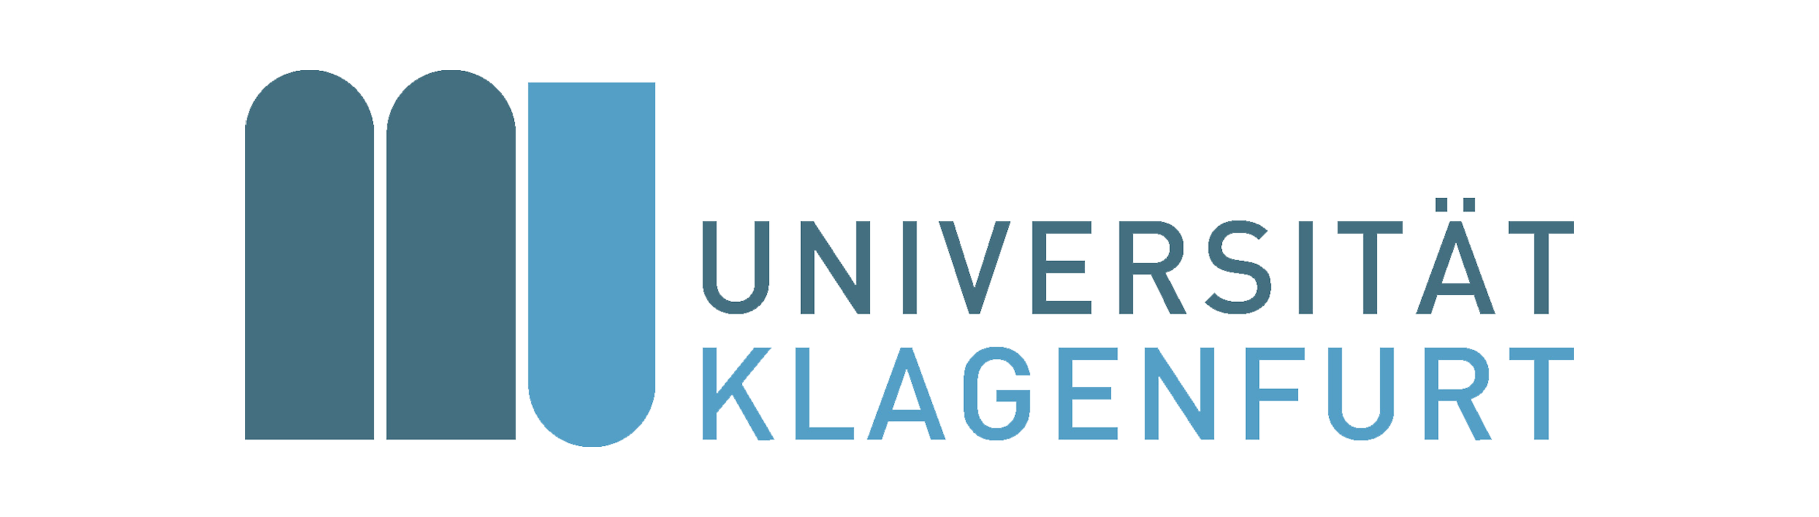 UNIKlagenfurt_LOGO2